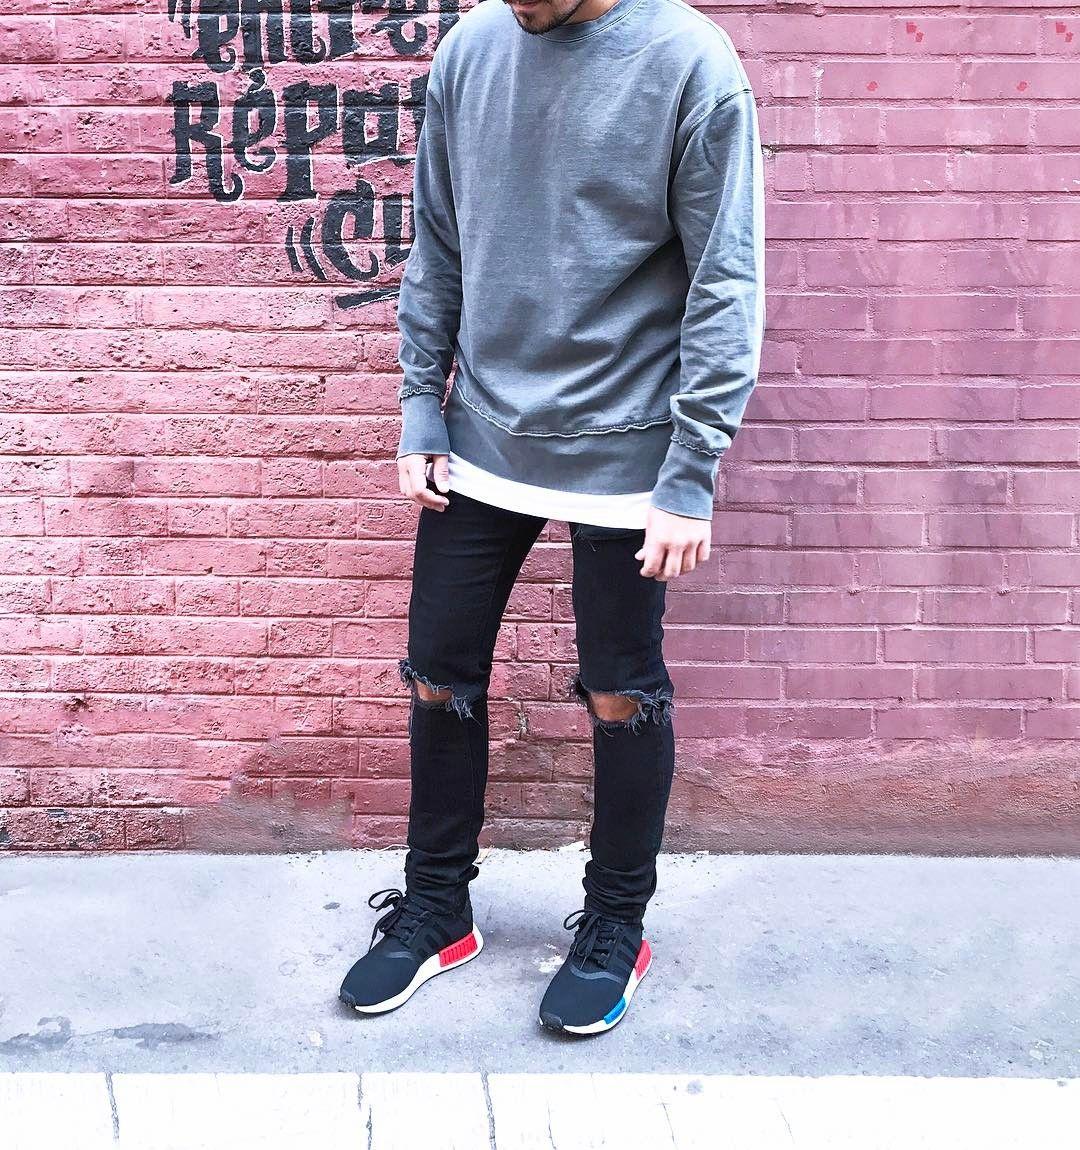 #Paris #ootd #ootdmen #street #streetstyle #stylemen #look #style #fashion #fashionista #men #menswear #menstyle #mensstyle #menfashion #mensfashion #mensfashionpost #simplefits #denim #instafashion #minimalmovement #mode #moda #hm #oversize #nmd #nmdog #sweat #sweater #adidasnmd